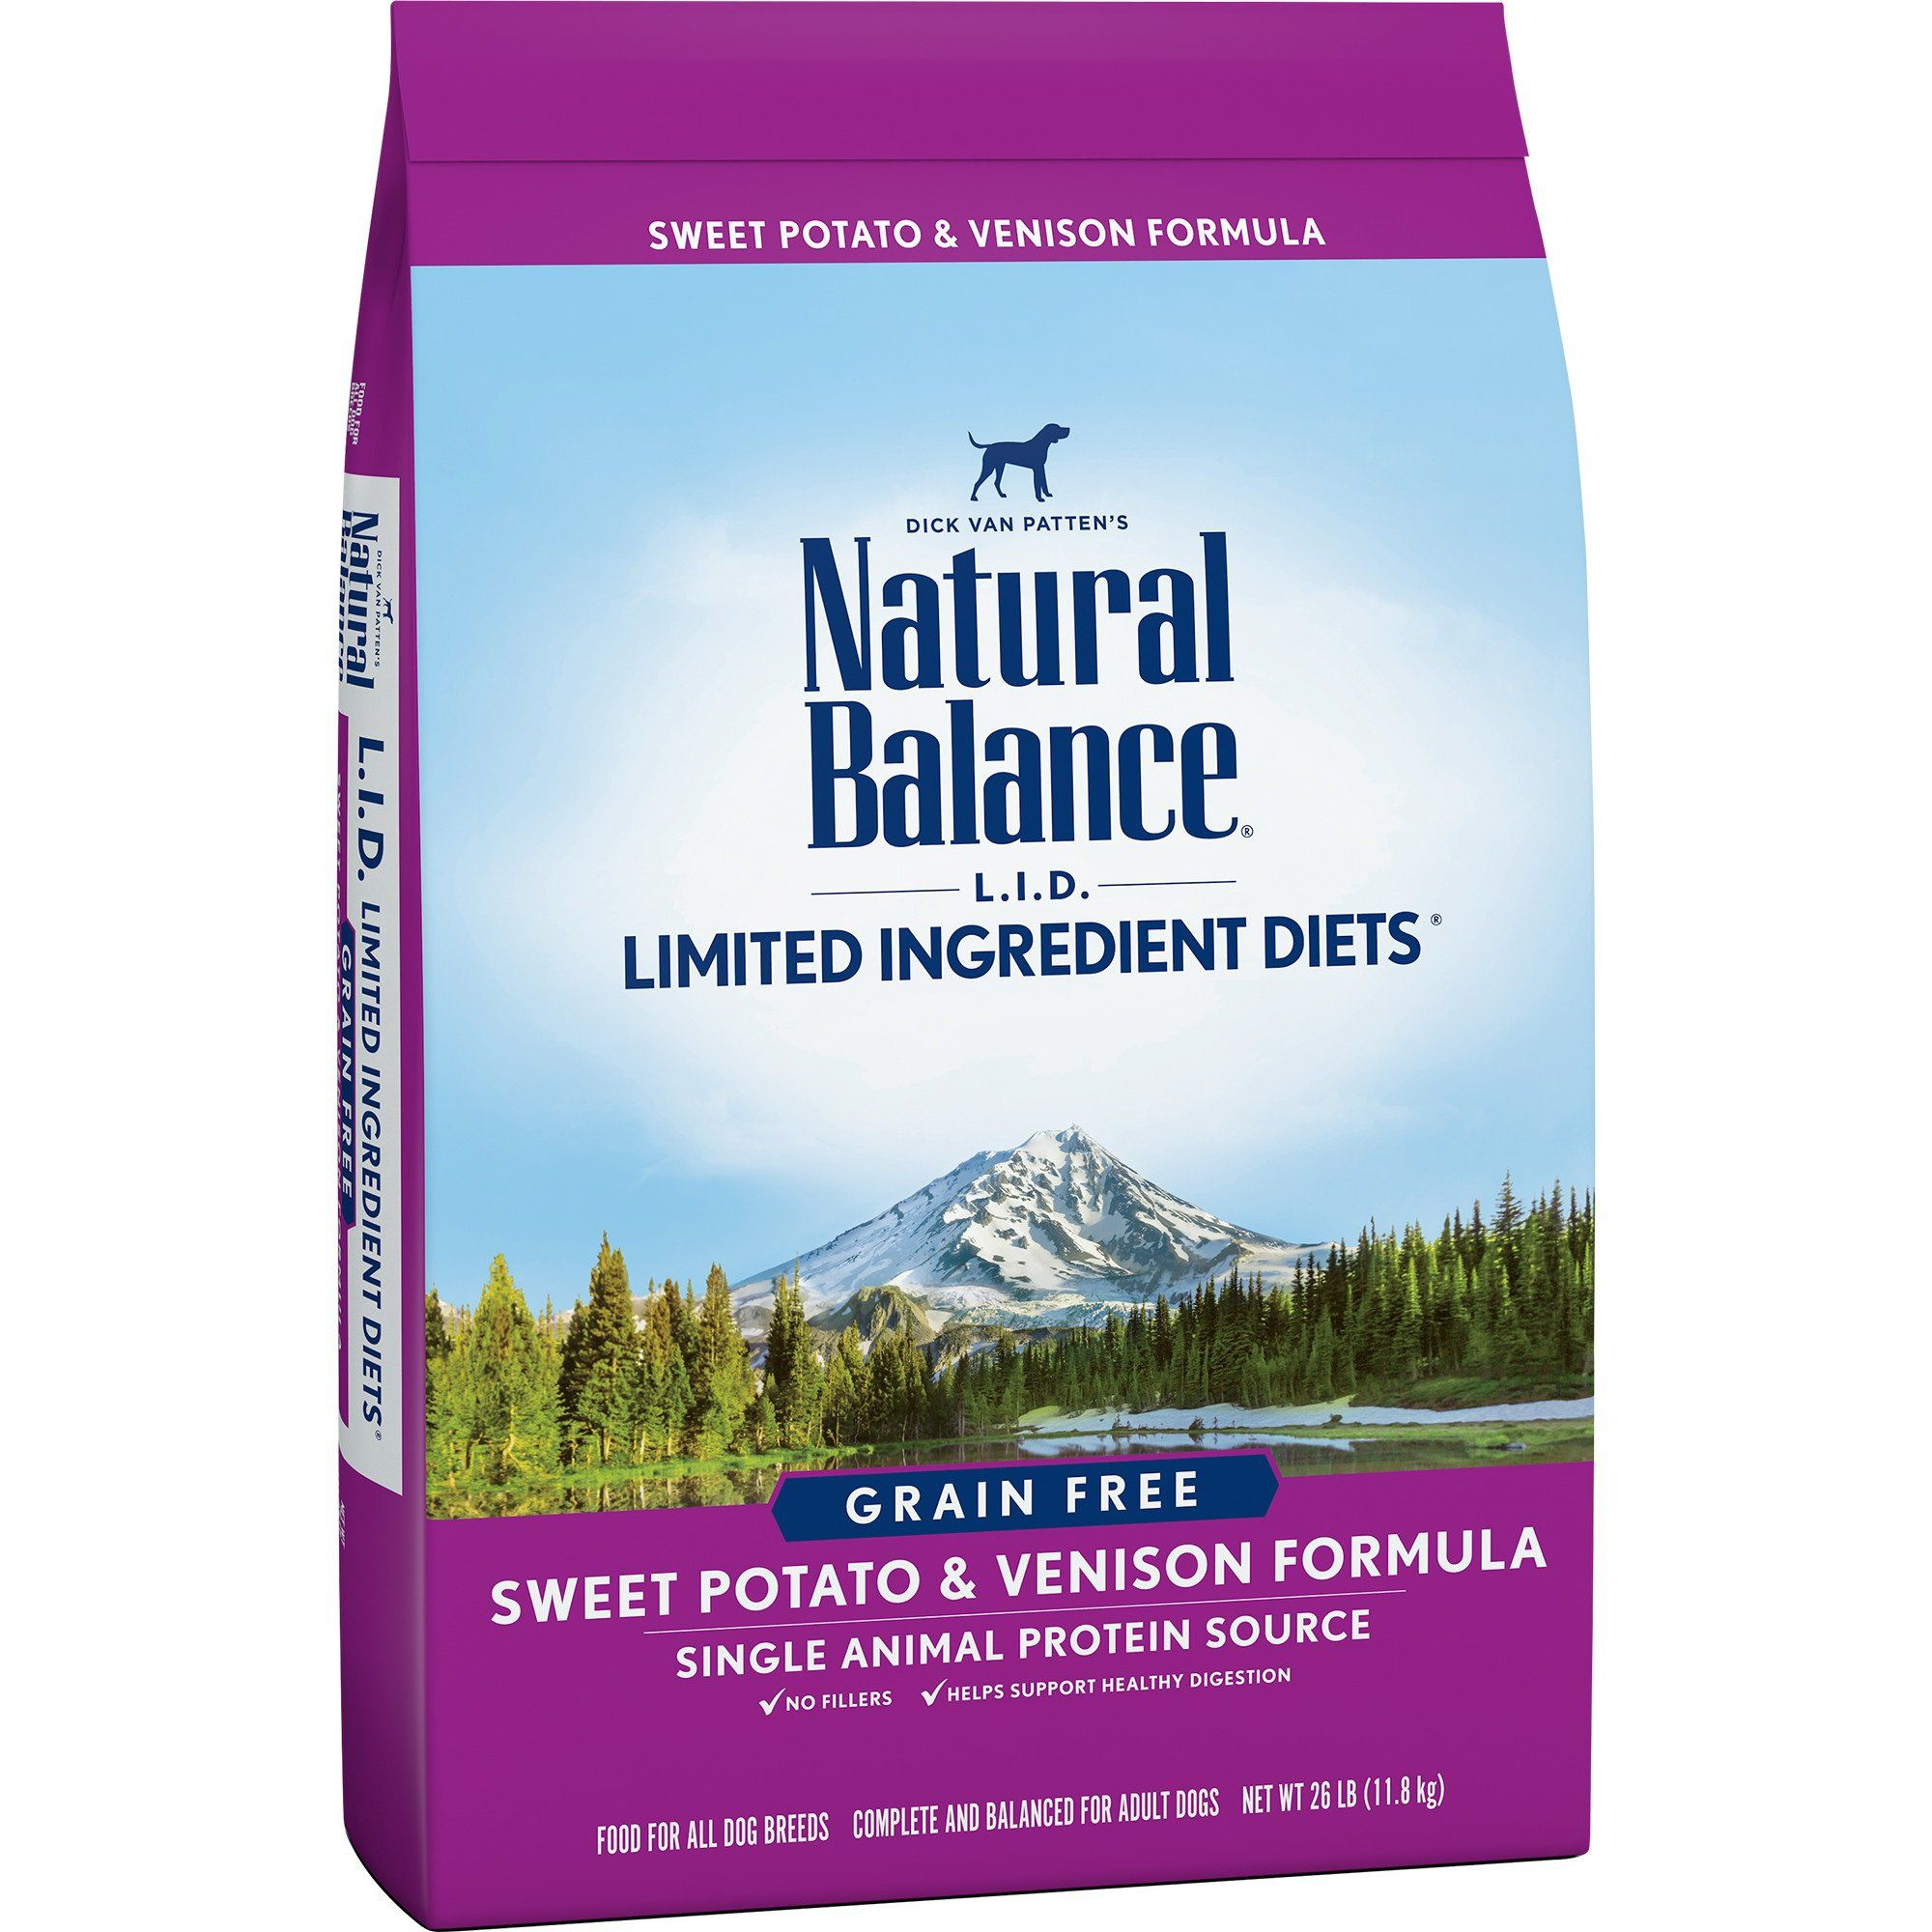 Natural Balance Dog Food Coupons >> Natural Balance L I D Limited Ingredient Diets Sweet Potato